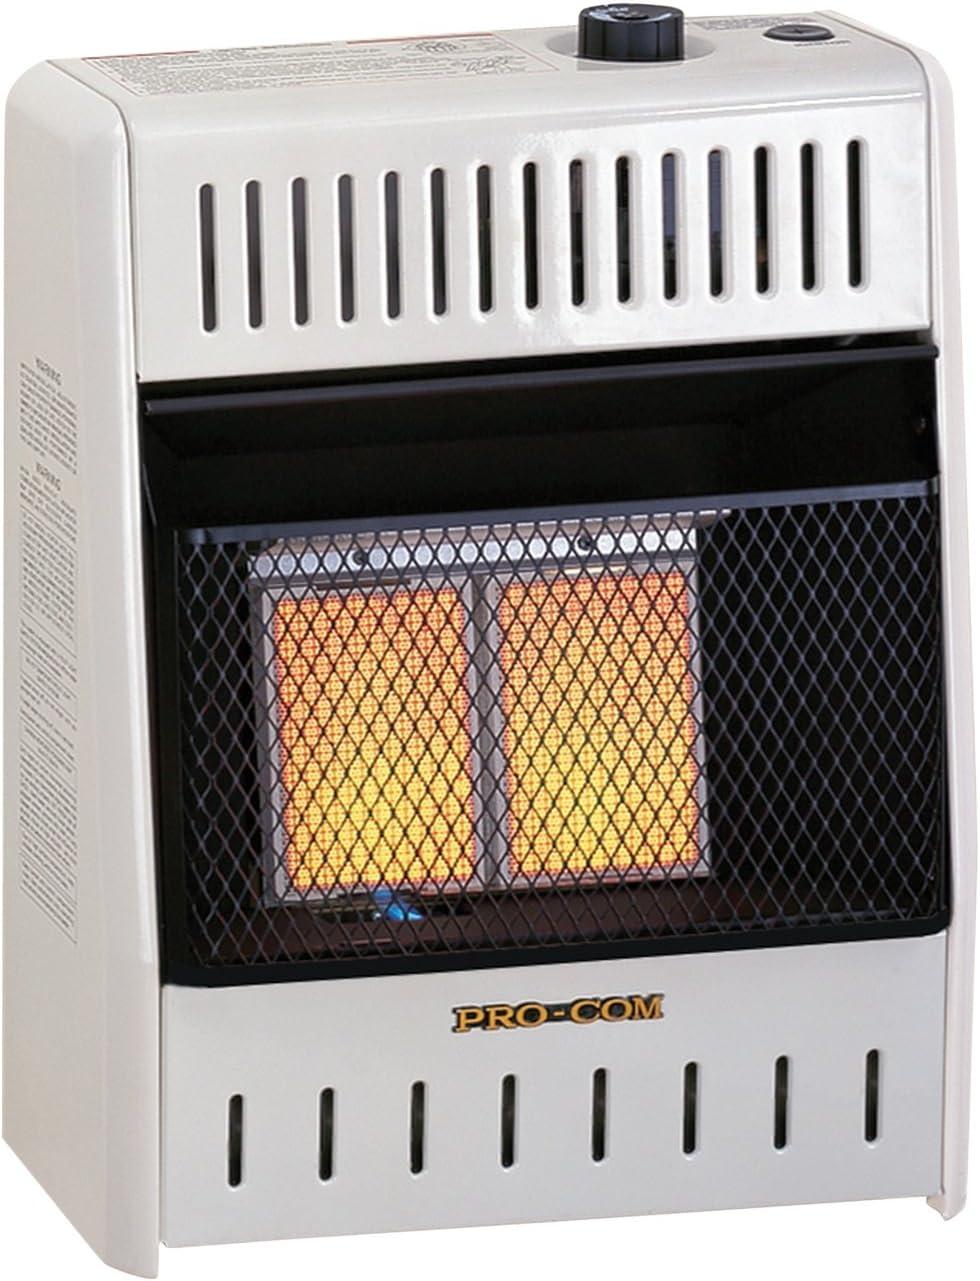 ProCom MNSD2TPA Dual NATURAL PROPANE Oklahoma City Mall Heater 00 Vent-Free Wholesale GAS 10